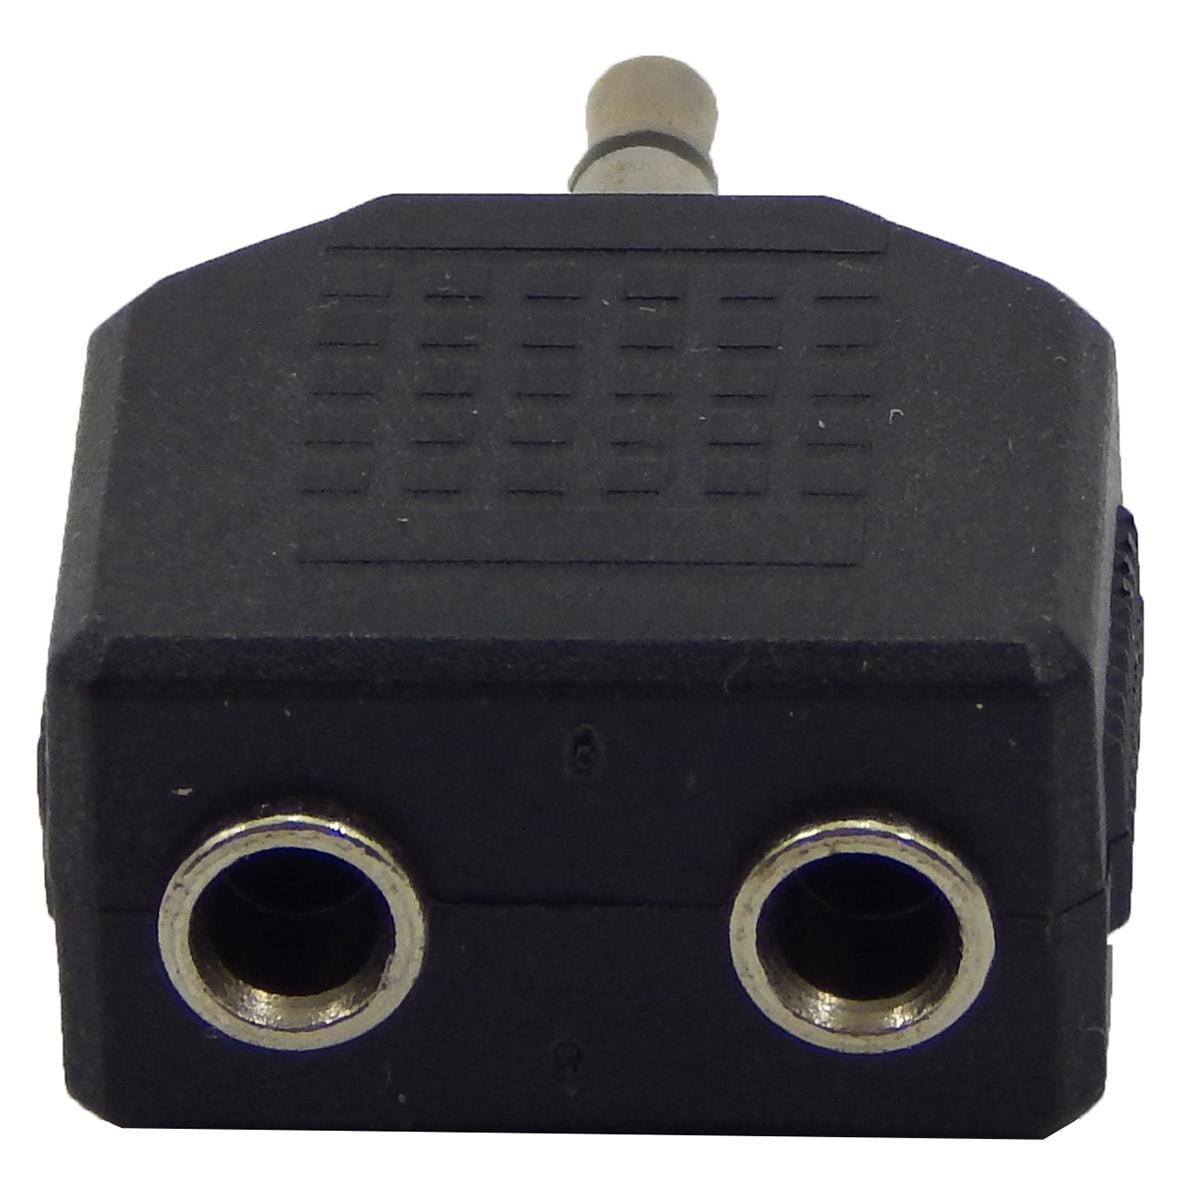 Adaptador de Audio P2 3.5m Macho p/ 2 x P2 3.5m Femea